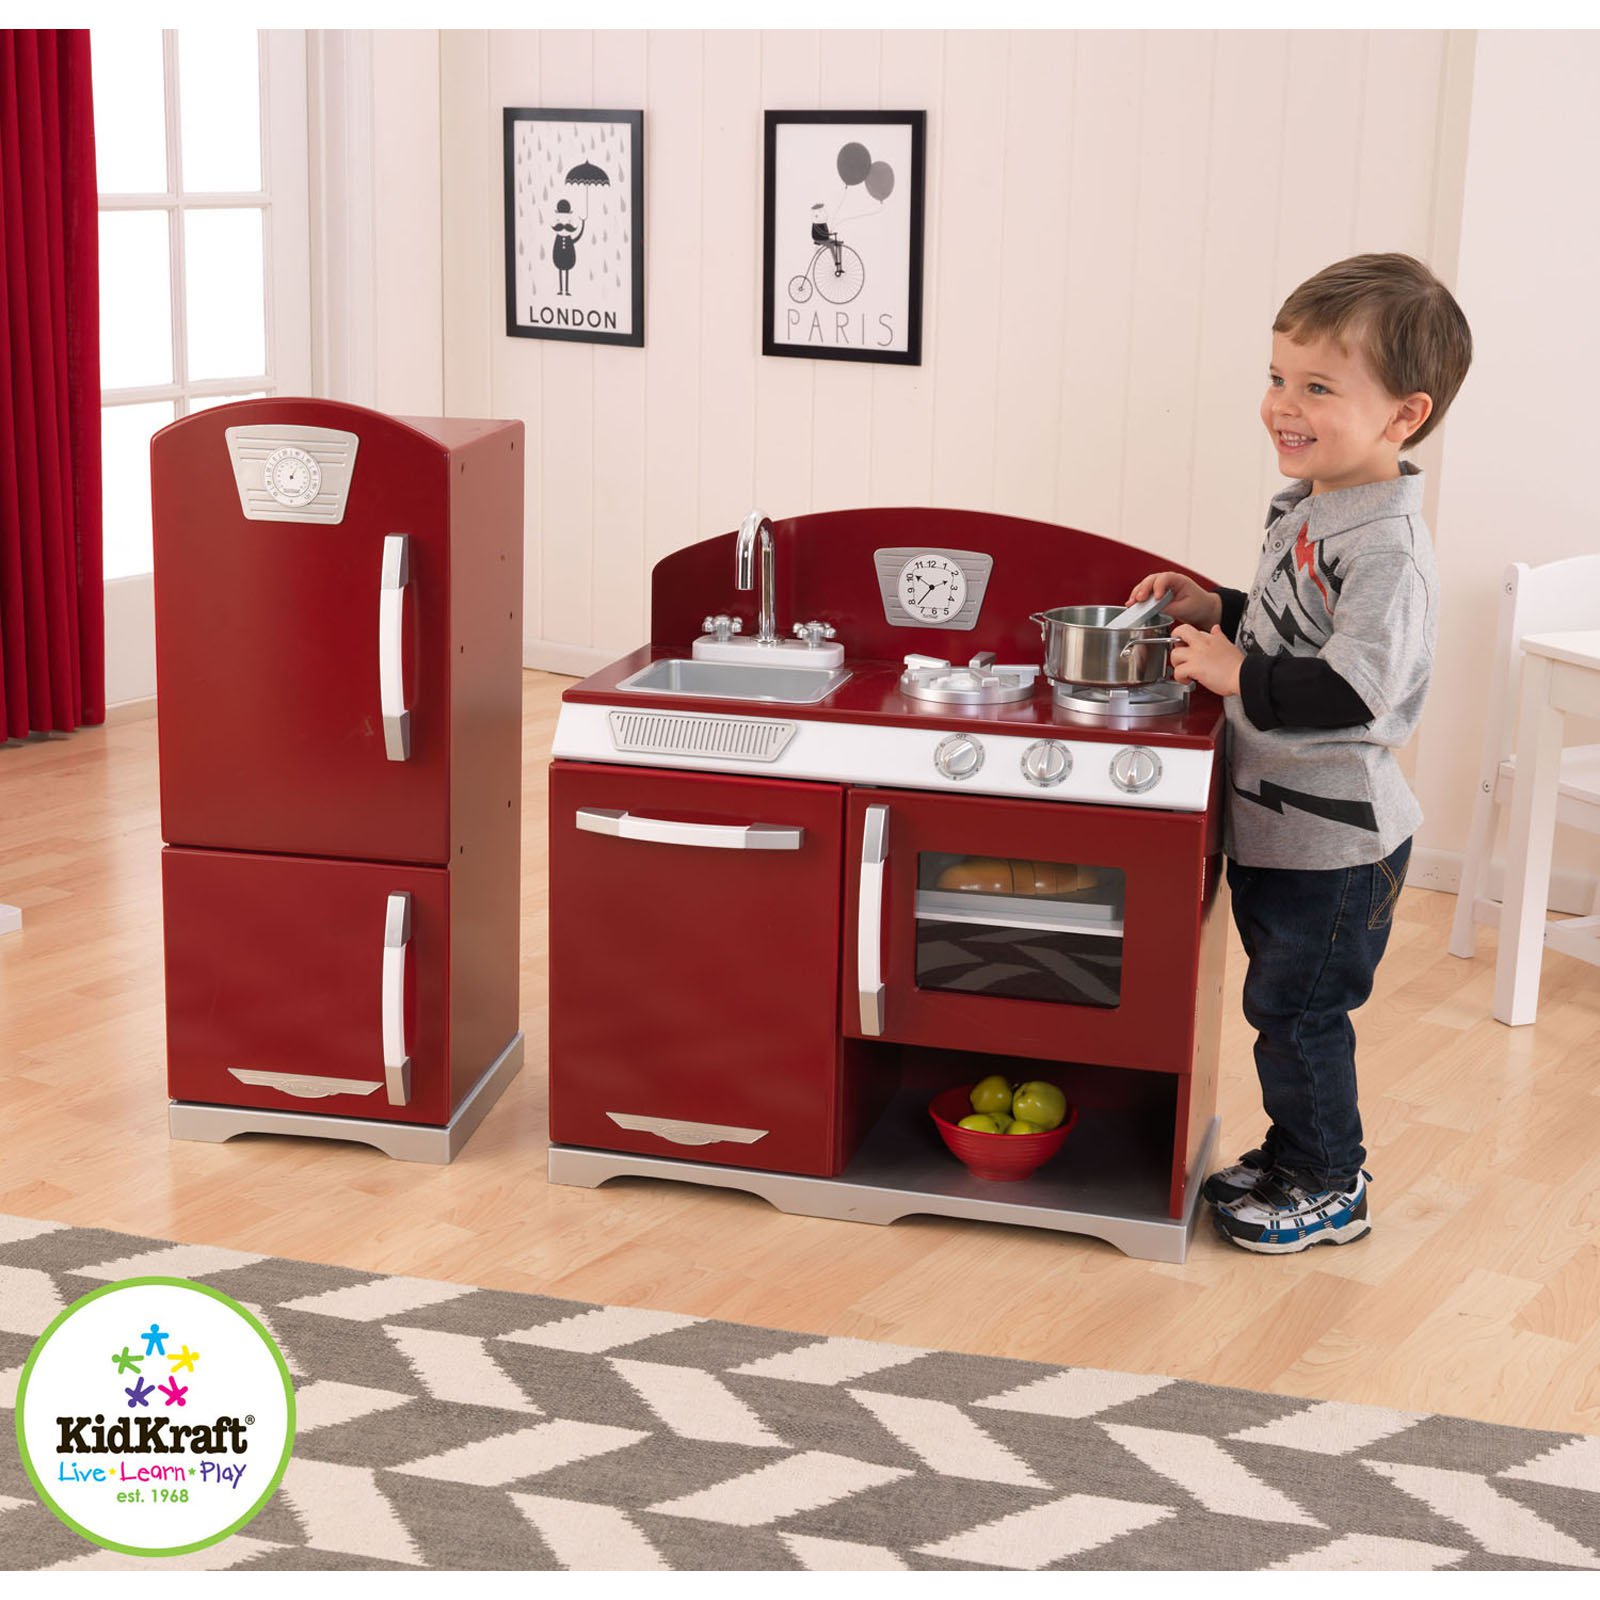 Kidcraft retro kitchen - Kidcraft Retro Kitchen 59